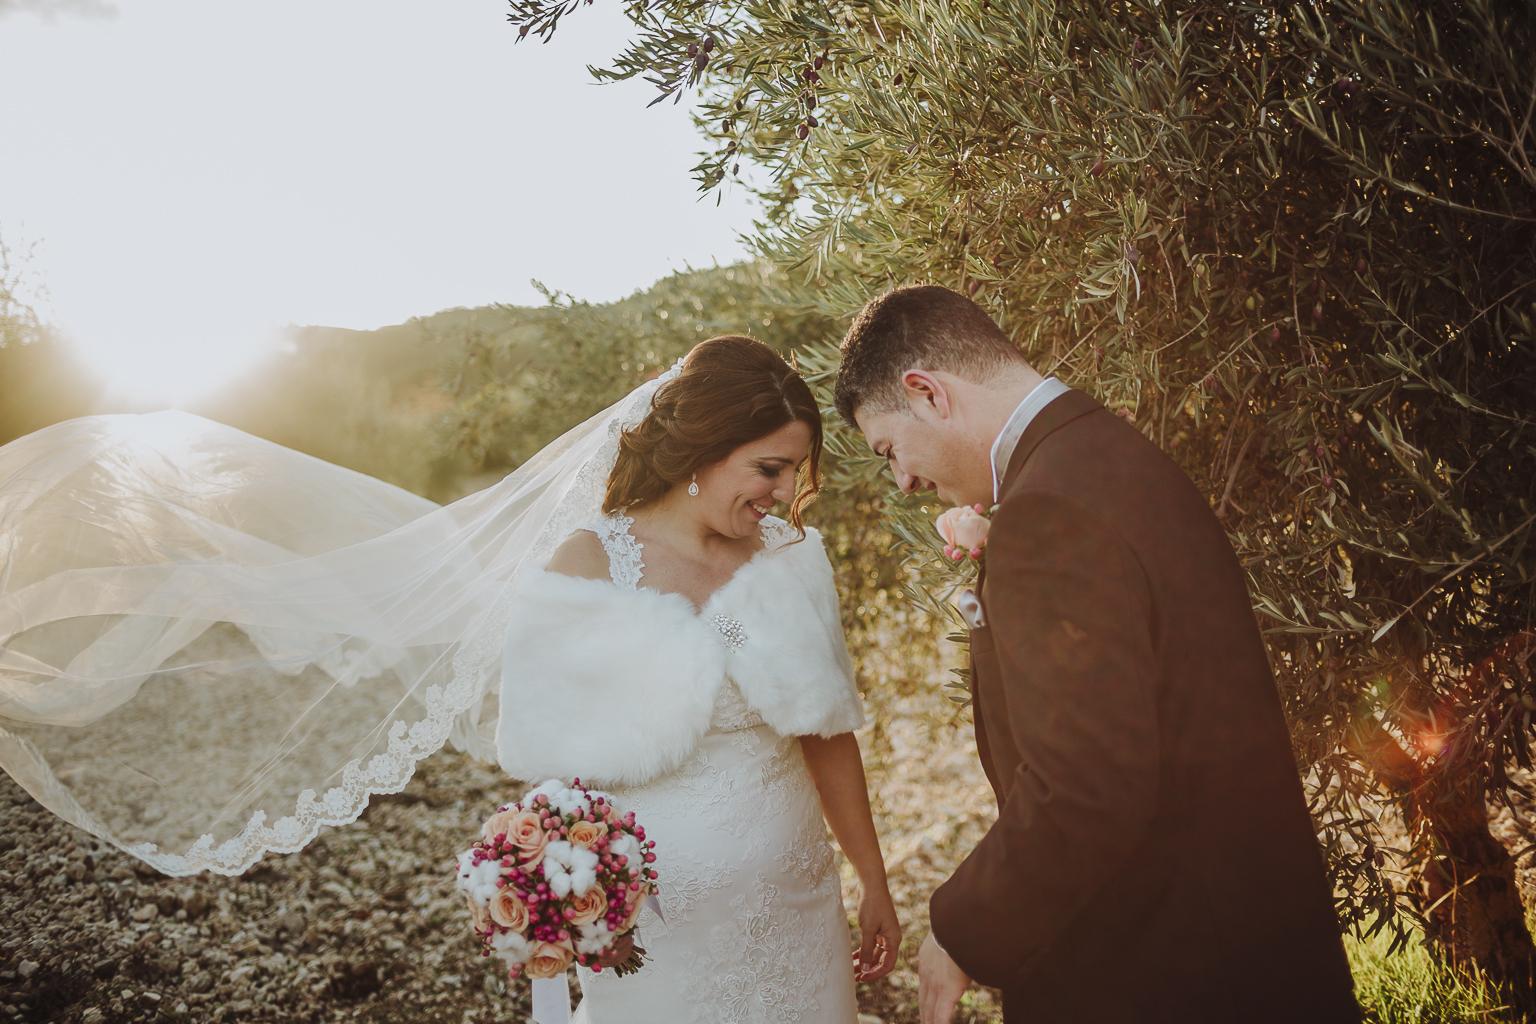 Fotógrafo de bodas Madrid :: Palacete de la Ochava :: Boda de Invierno :: Boda en un hotel :: Boda romántica :: Boda con estilo :: First Sight